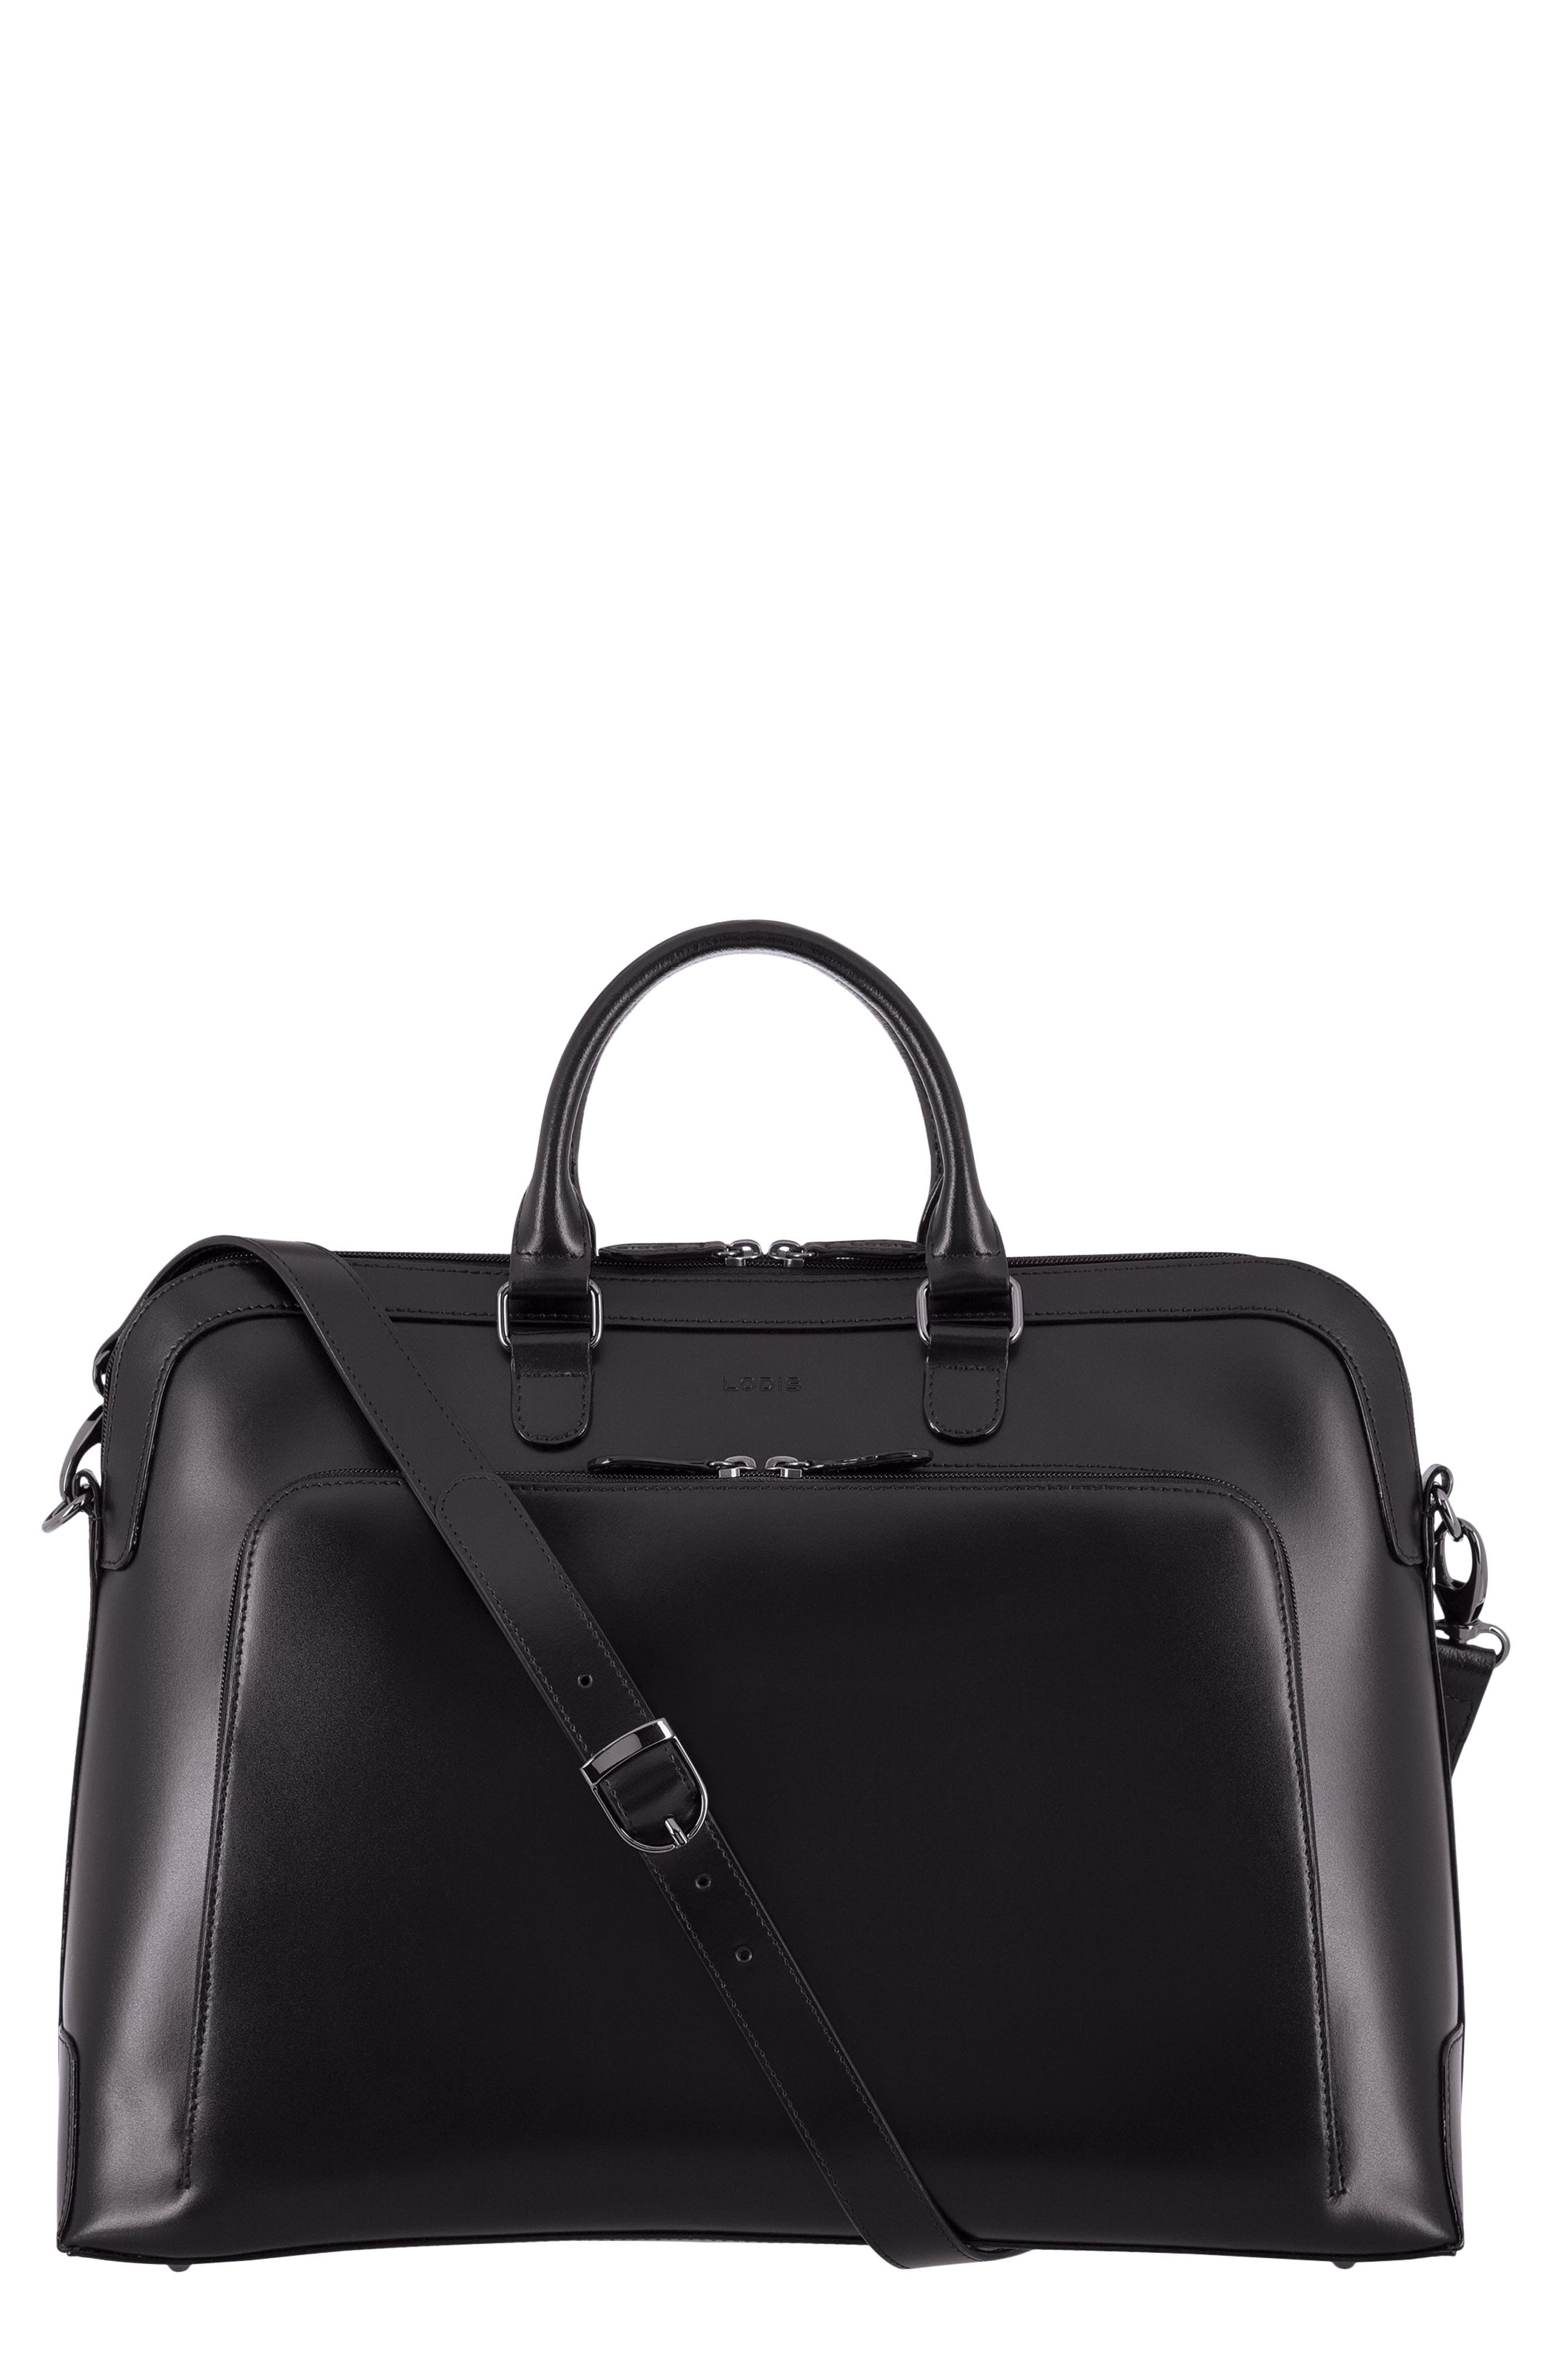 Audrey Under Lock & Key - Brera RFID Leather Briefcase,                         Main,                         color, BLACK/ BLACK